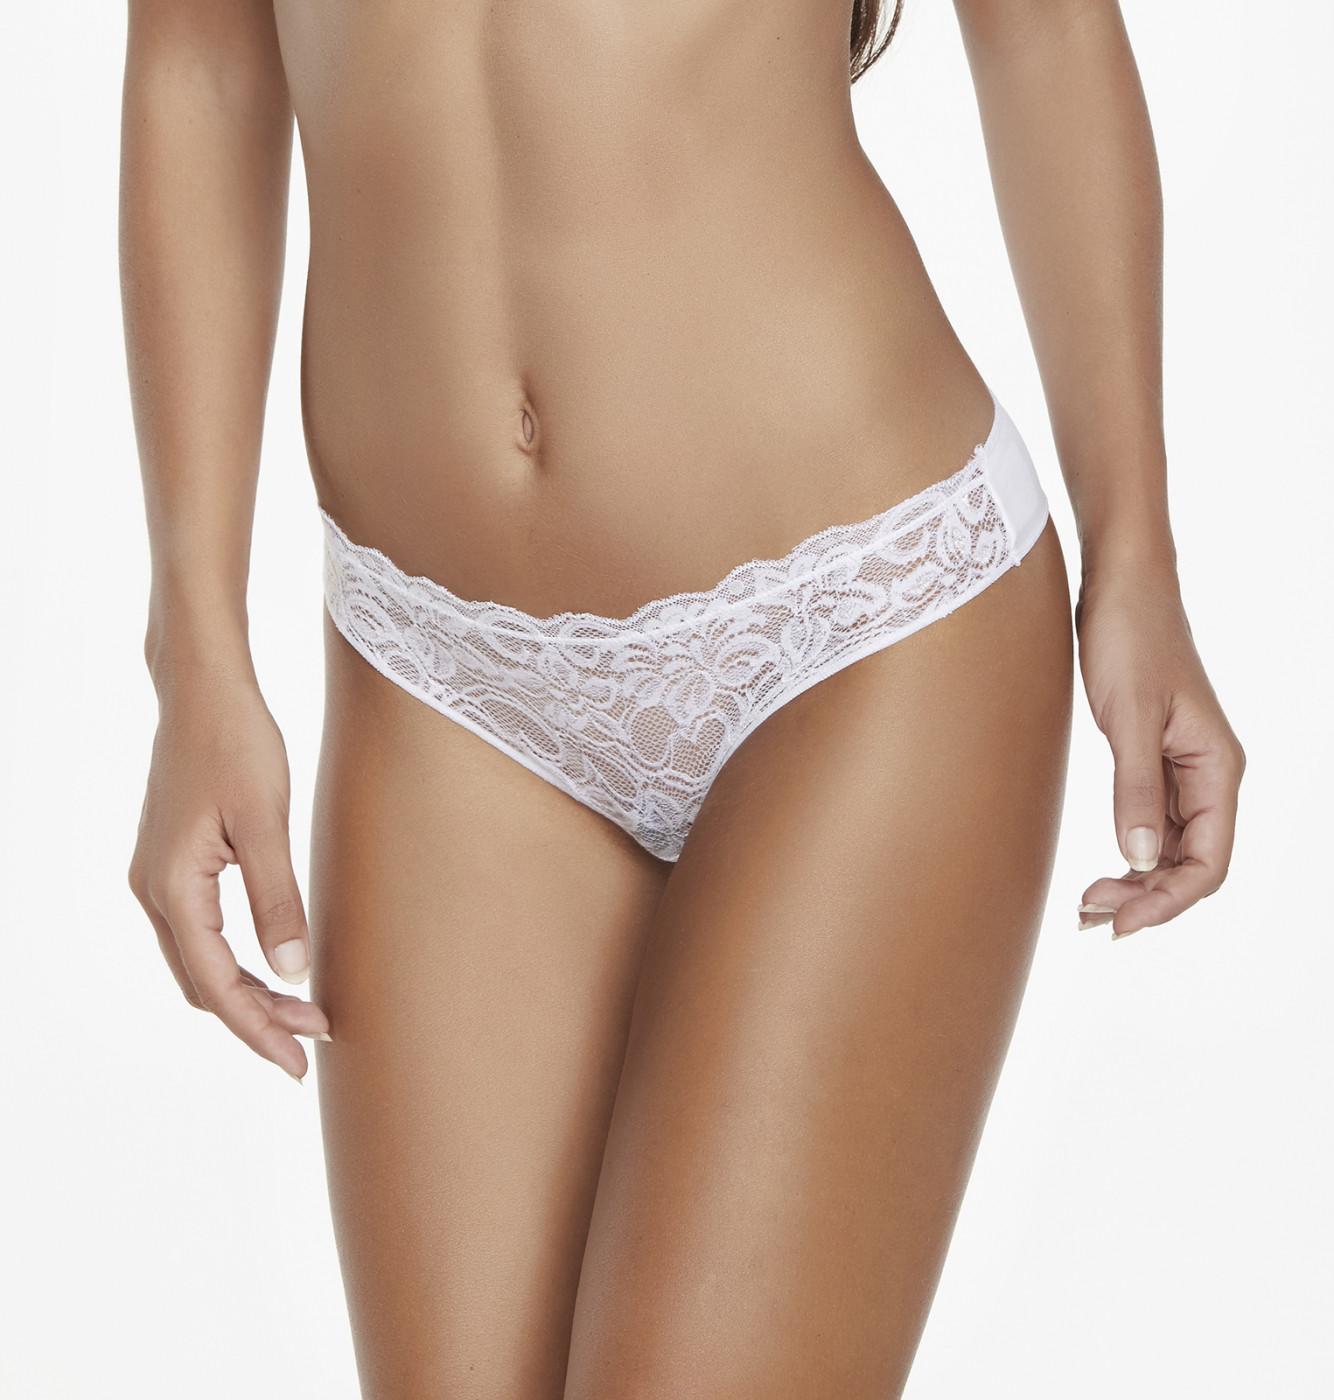 Womens panties Pierre Cardin Ninfea